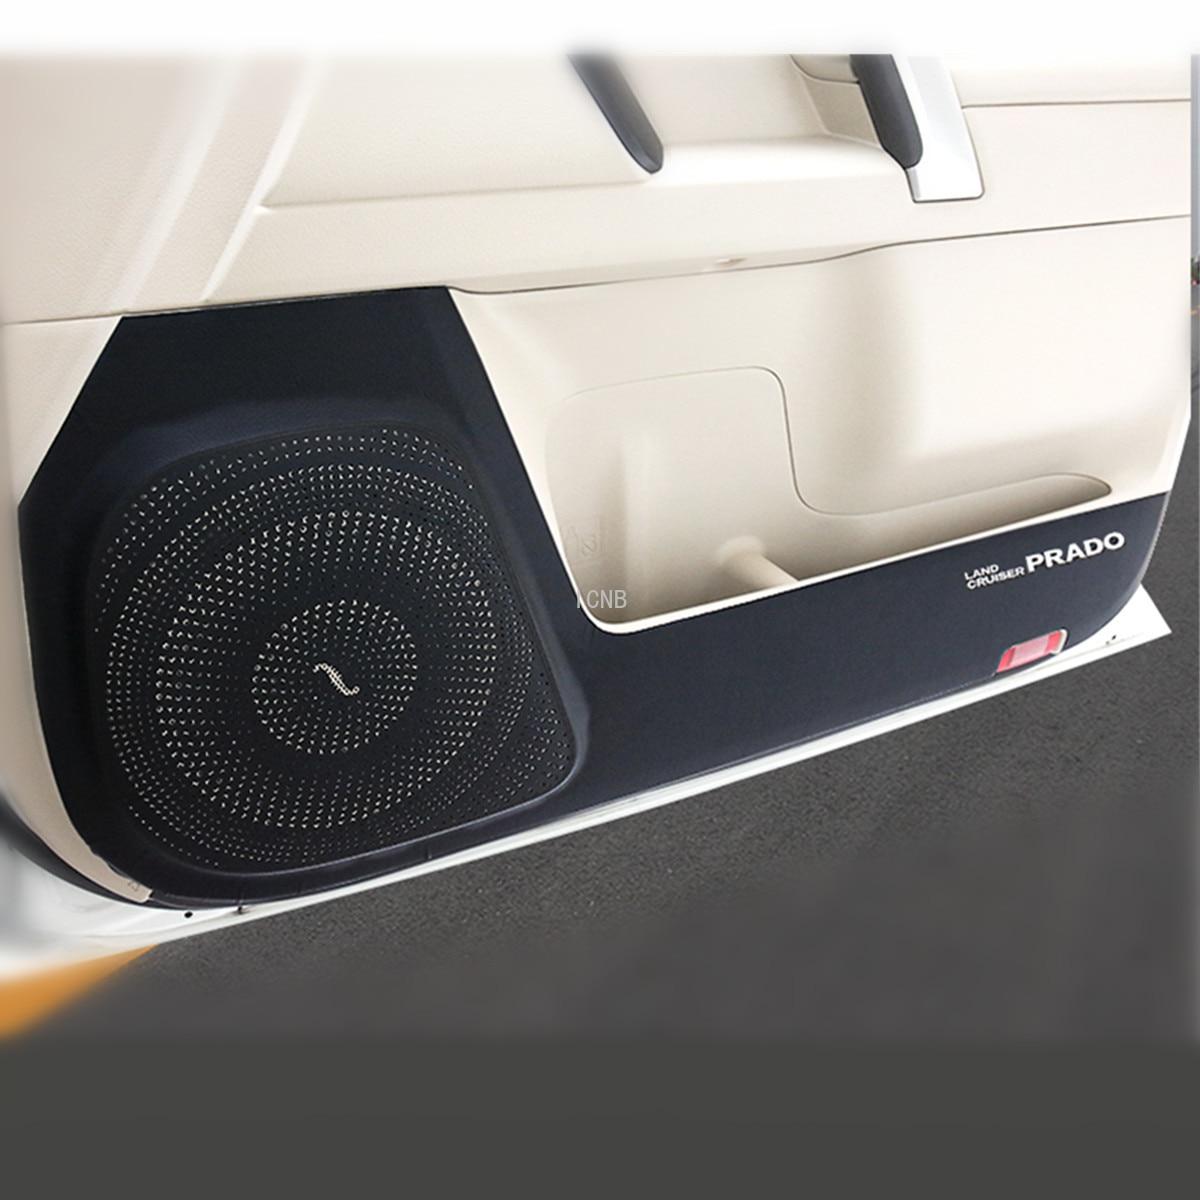 Para Toyota Land Cruiser Prado 150, 2010, 2011, 2012, 2013, 2014, 2015, 2016, 2017, pegatina antigolpes de cuero auténtico para puerta